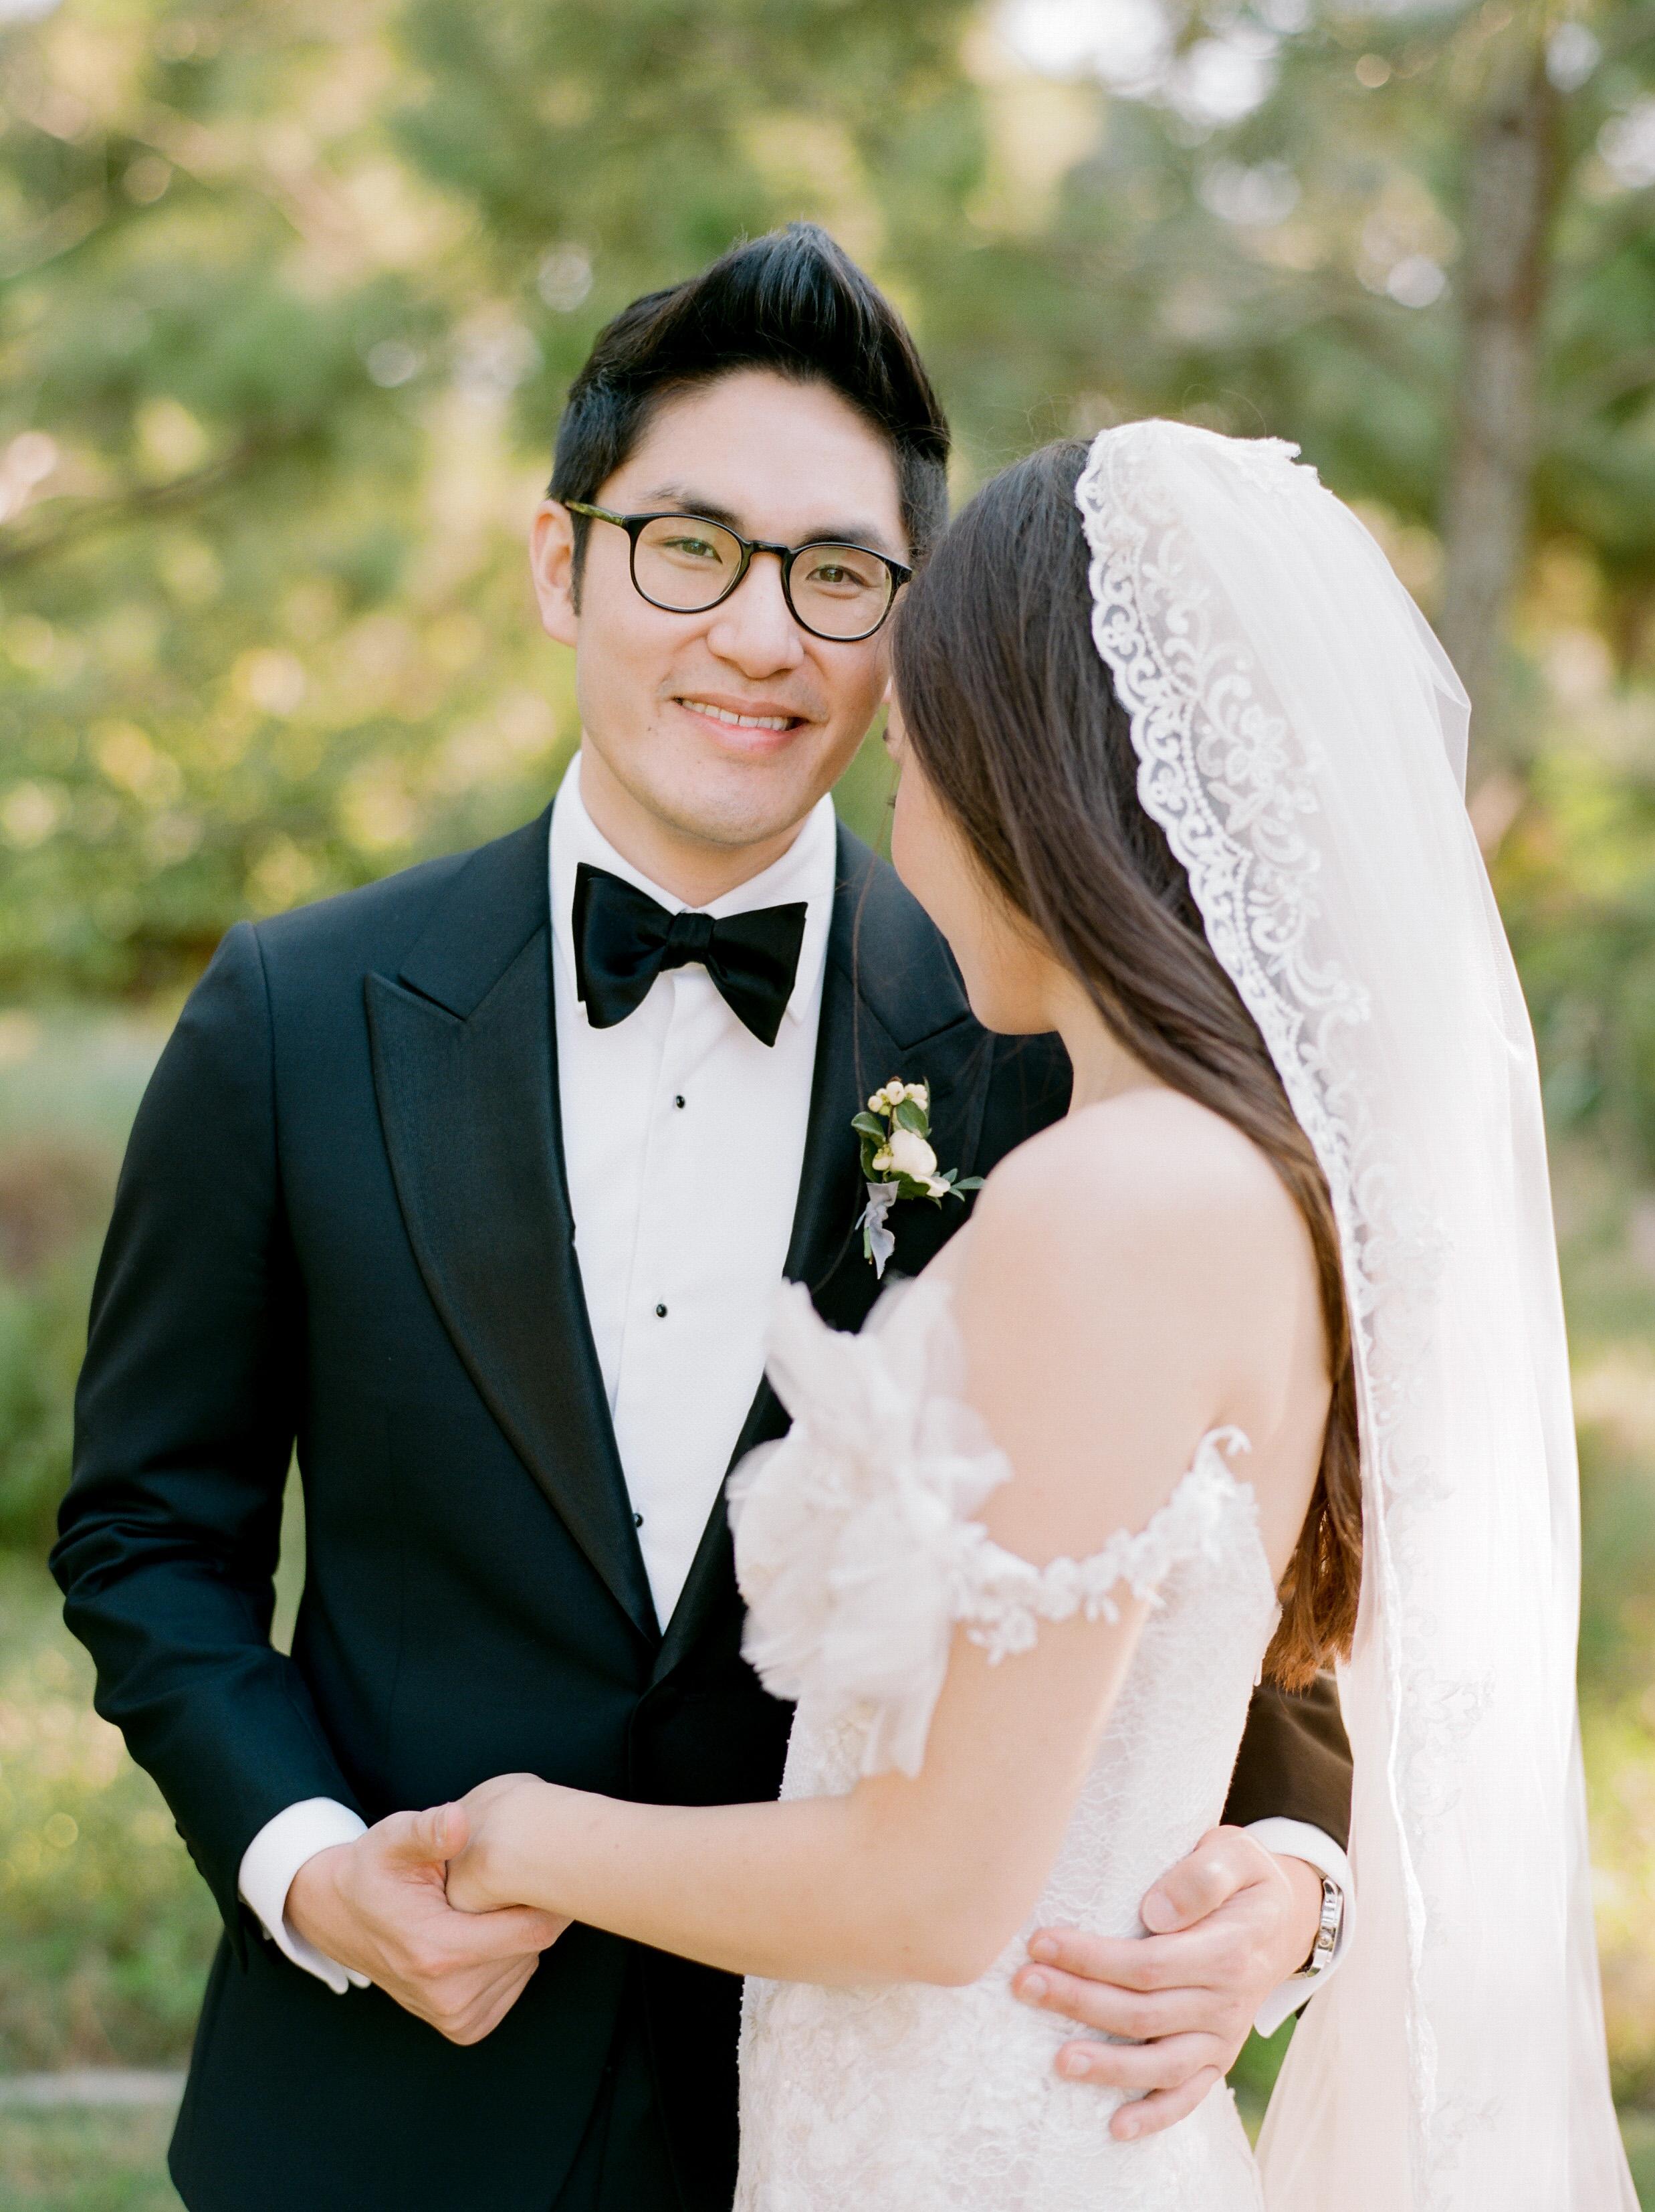 Martha-Stewart-Wedding-Dana-Fernandez-Photography-Josh-Texas-Film-Houston-Wedding-Fine-Art-Photographer-McGovern-Centennial-Gardens-Top-Best-43.jpg